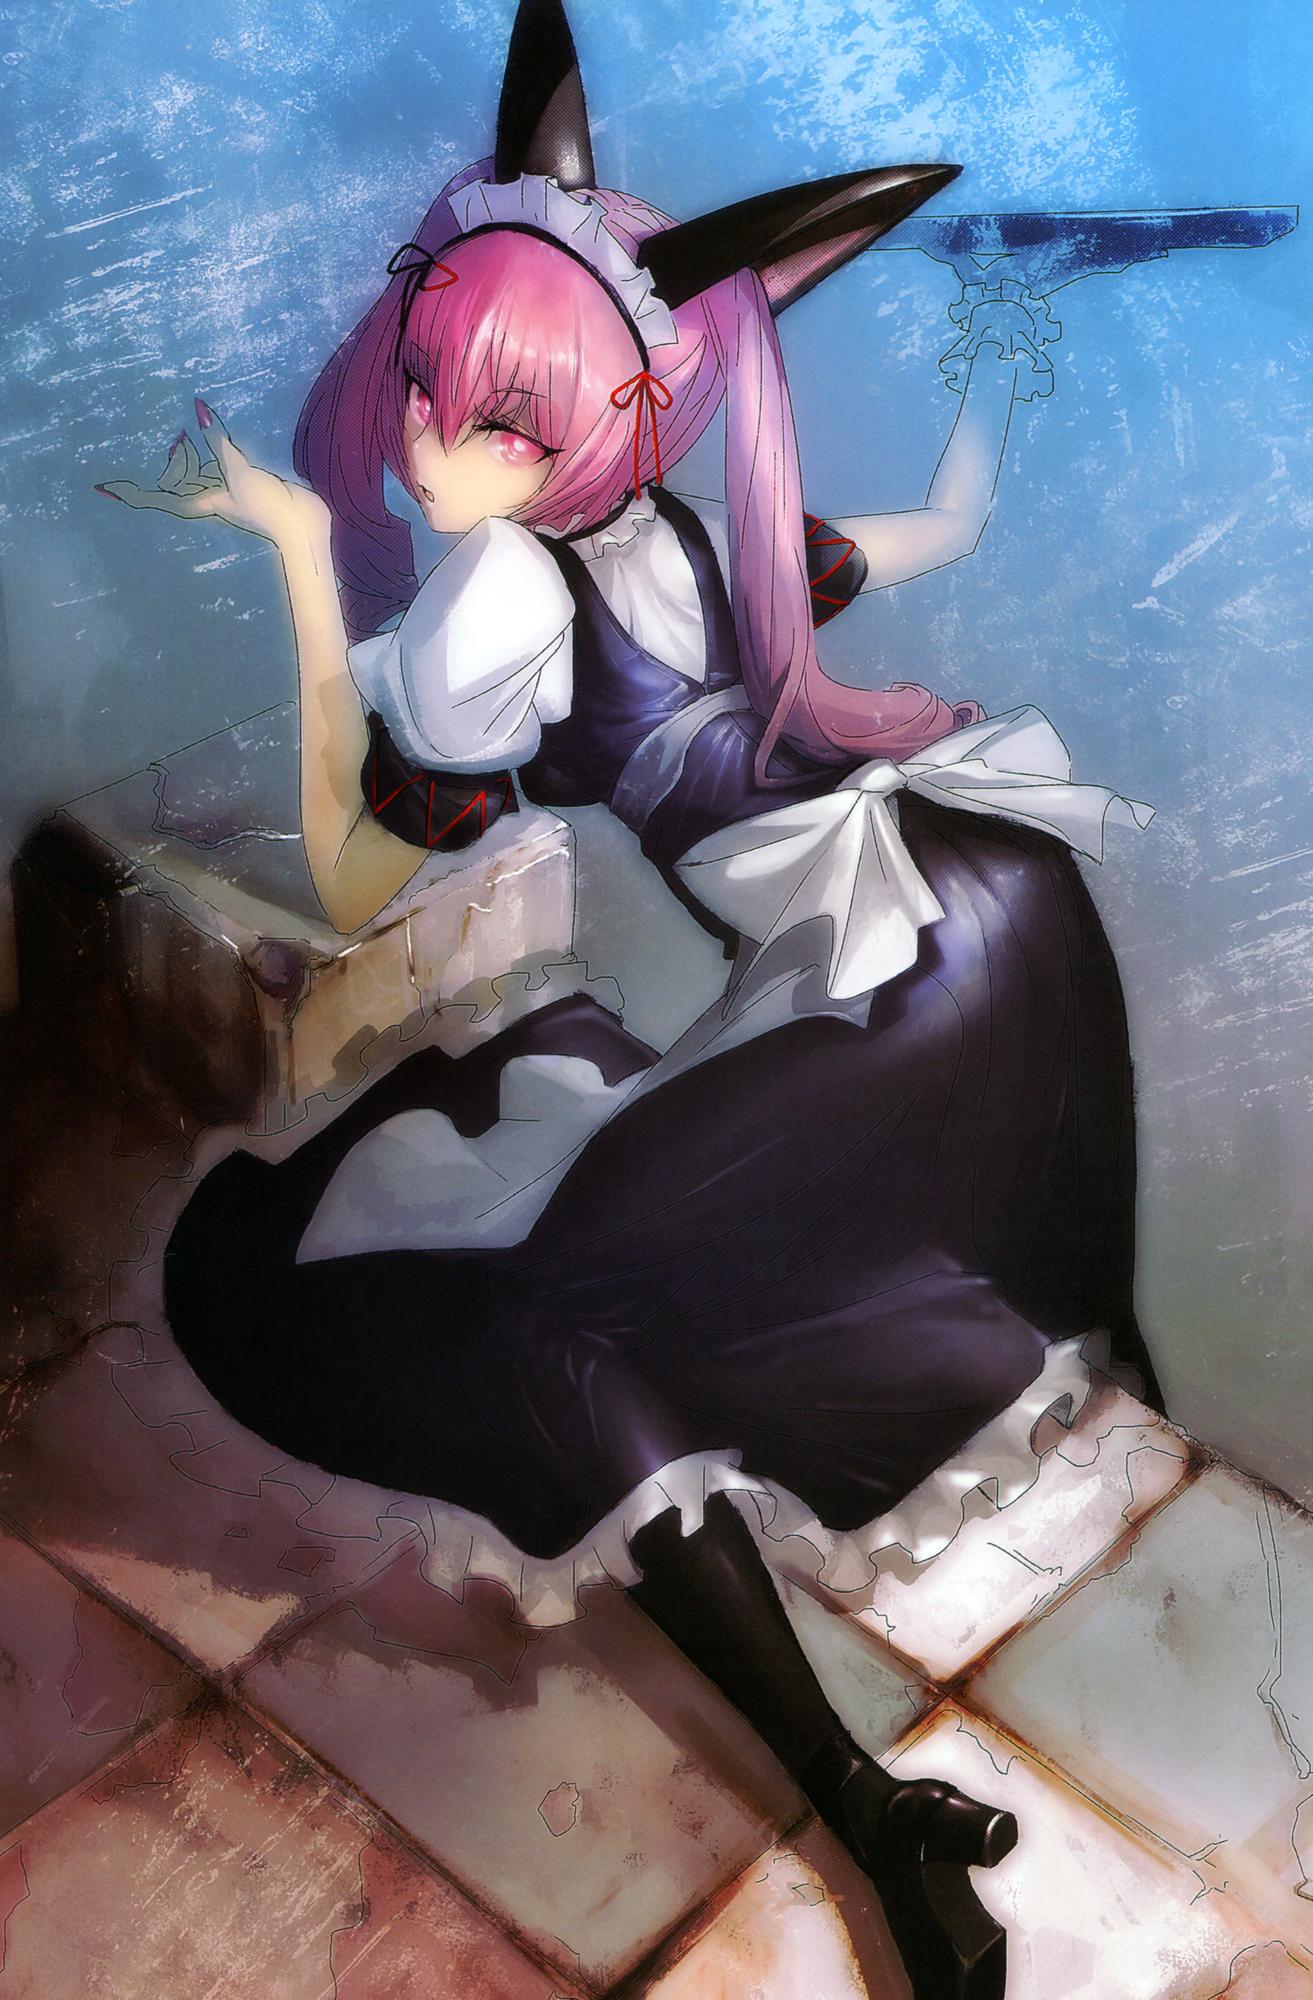 Rumiho Akiha - Steins;Gate - Mobile Wallpaper #961485 - Zerochan ...